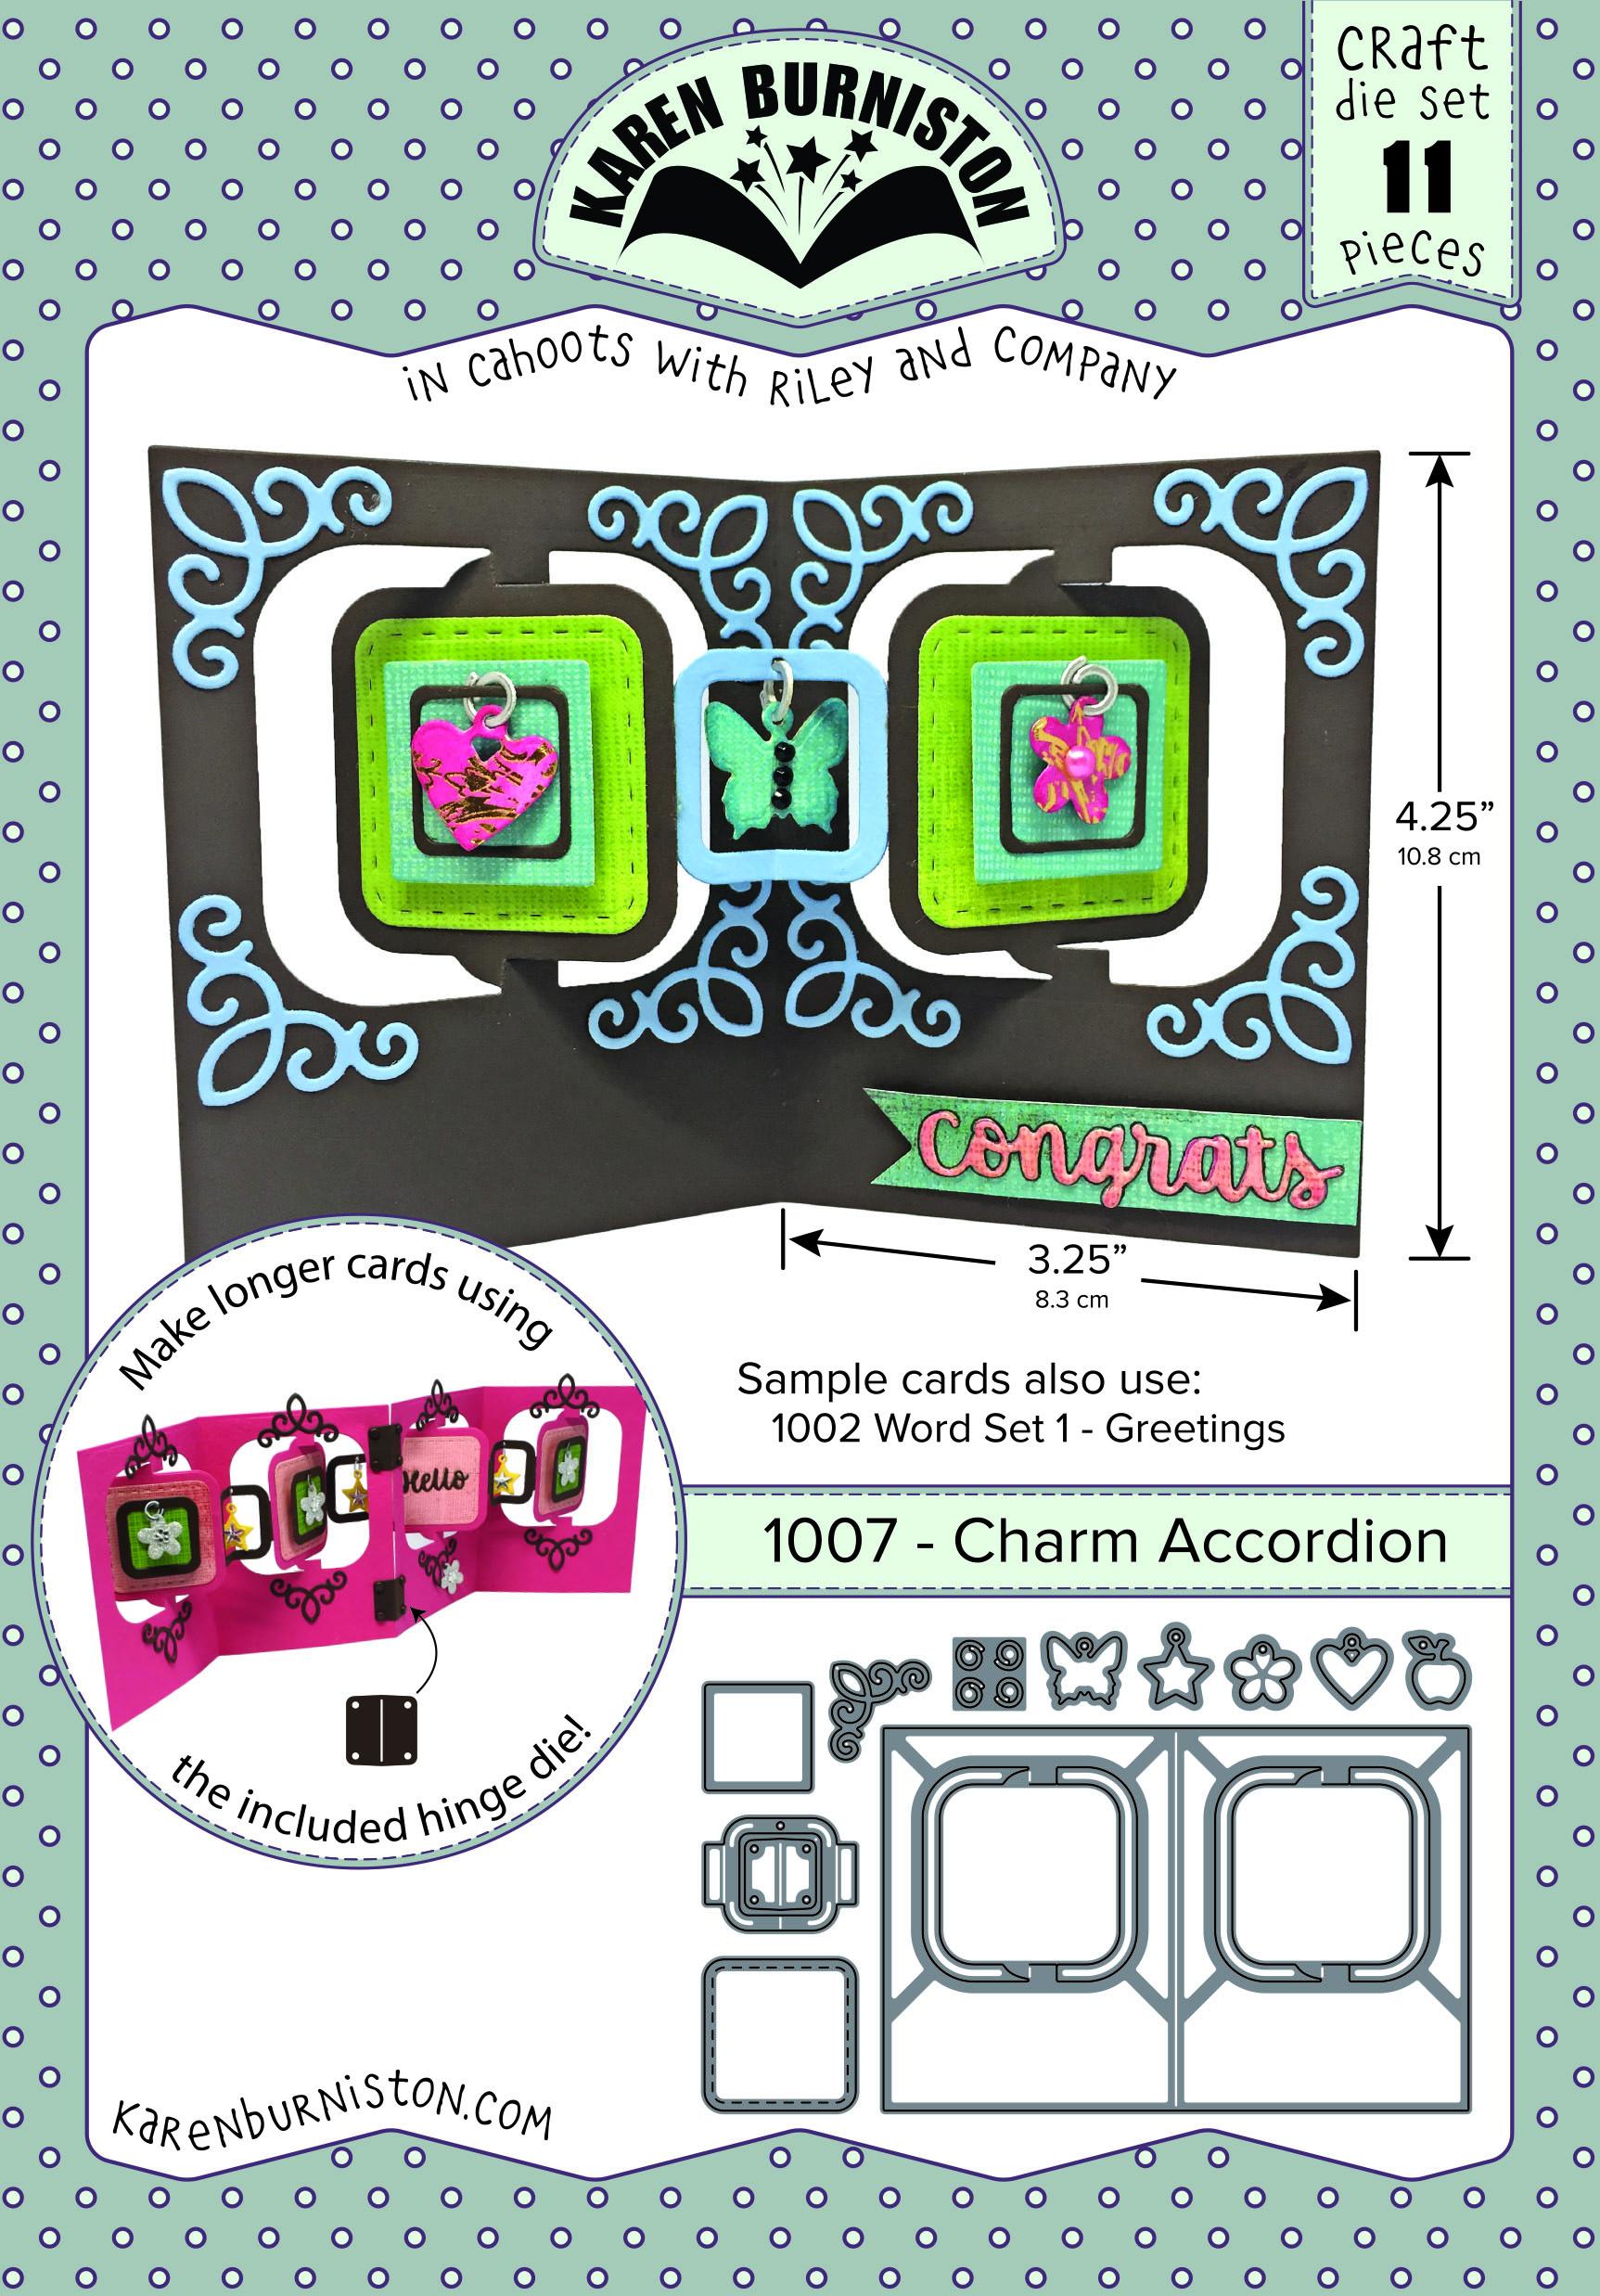 1007-charmaccordion.jpg